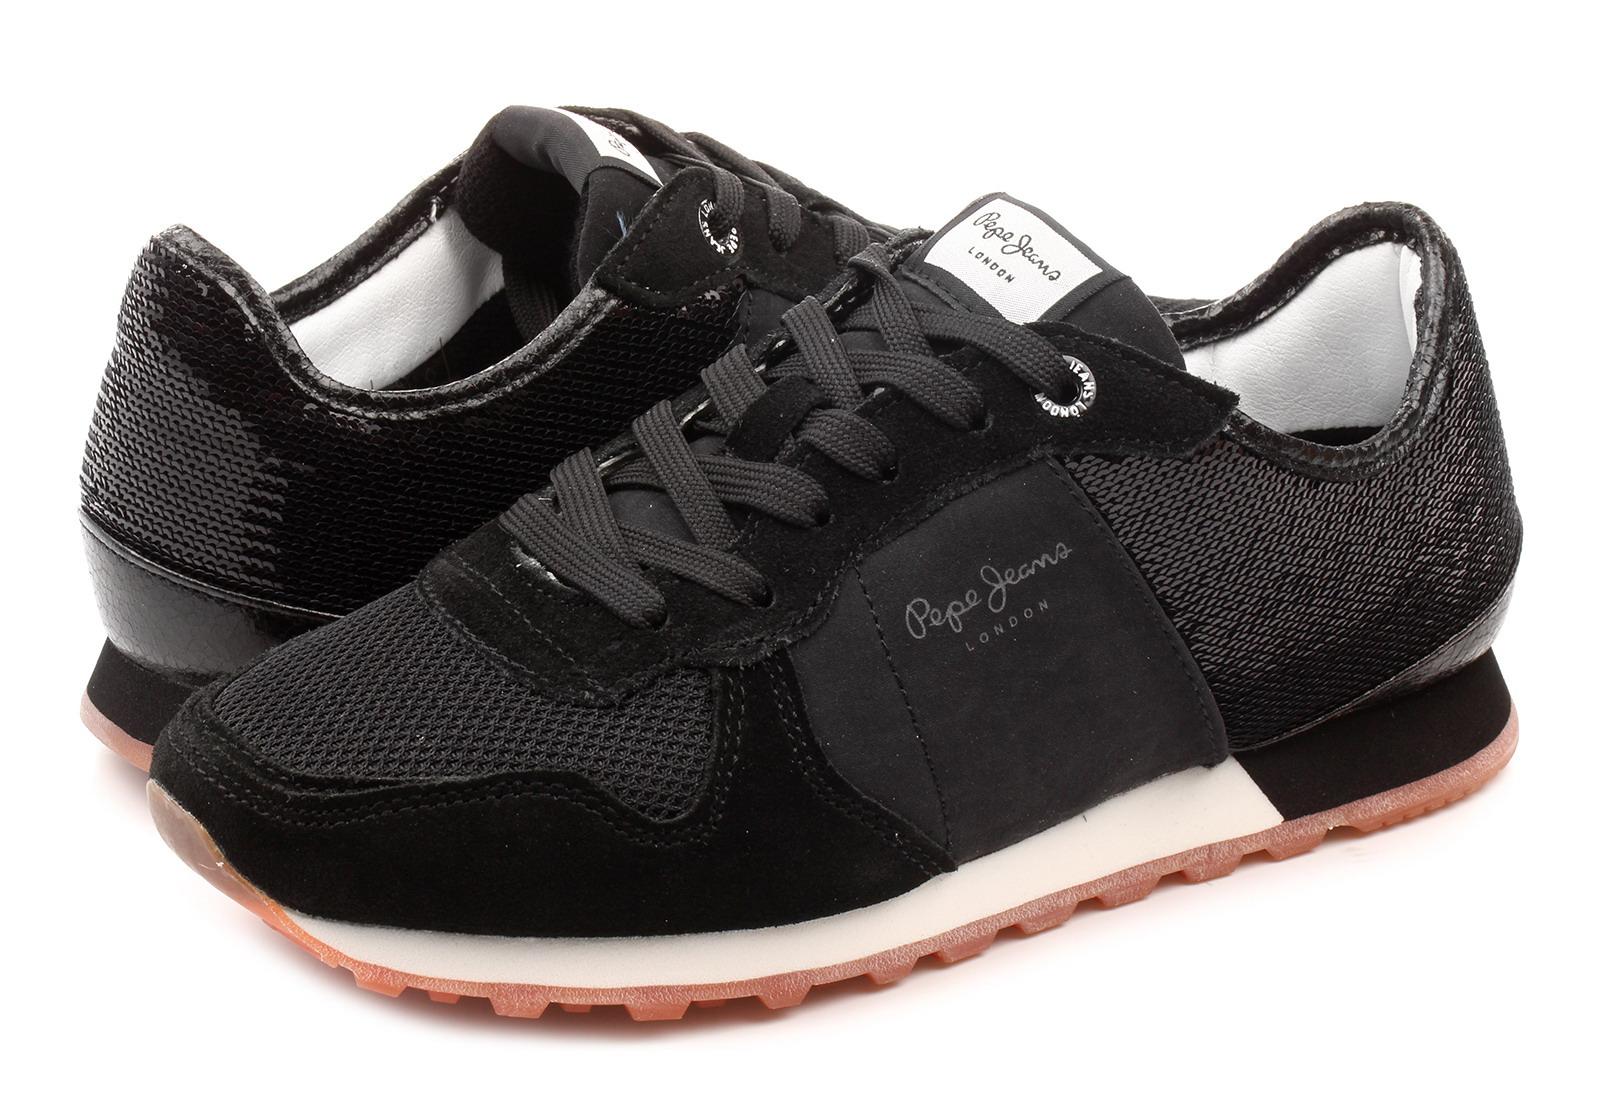 Pepe Jeans Cipő női fekete